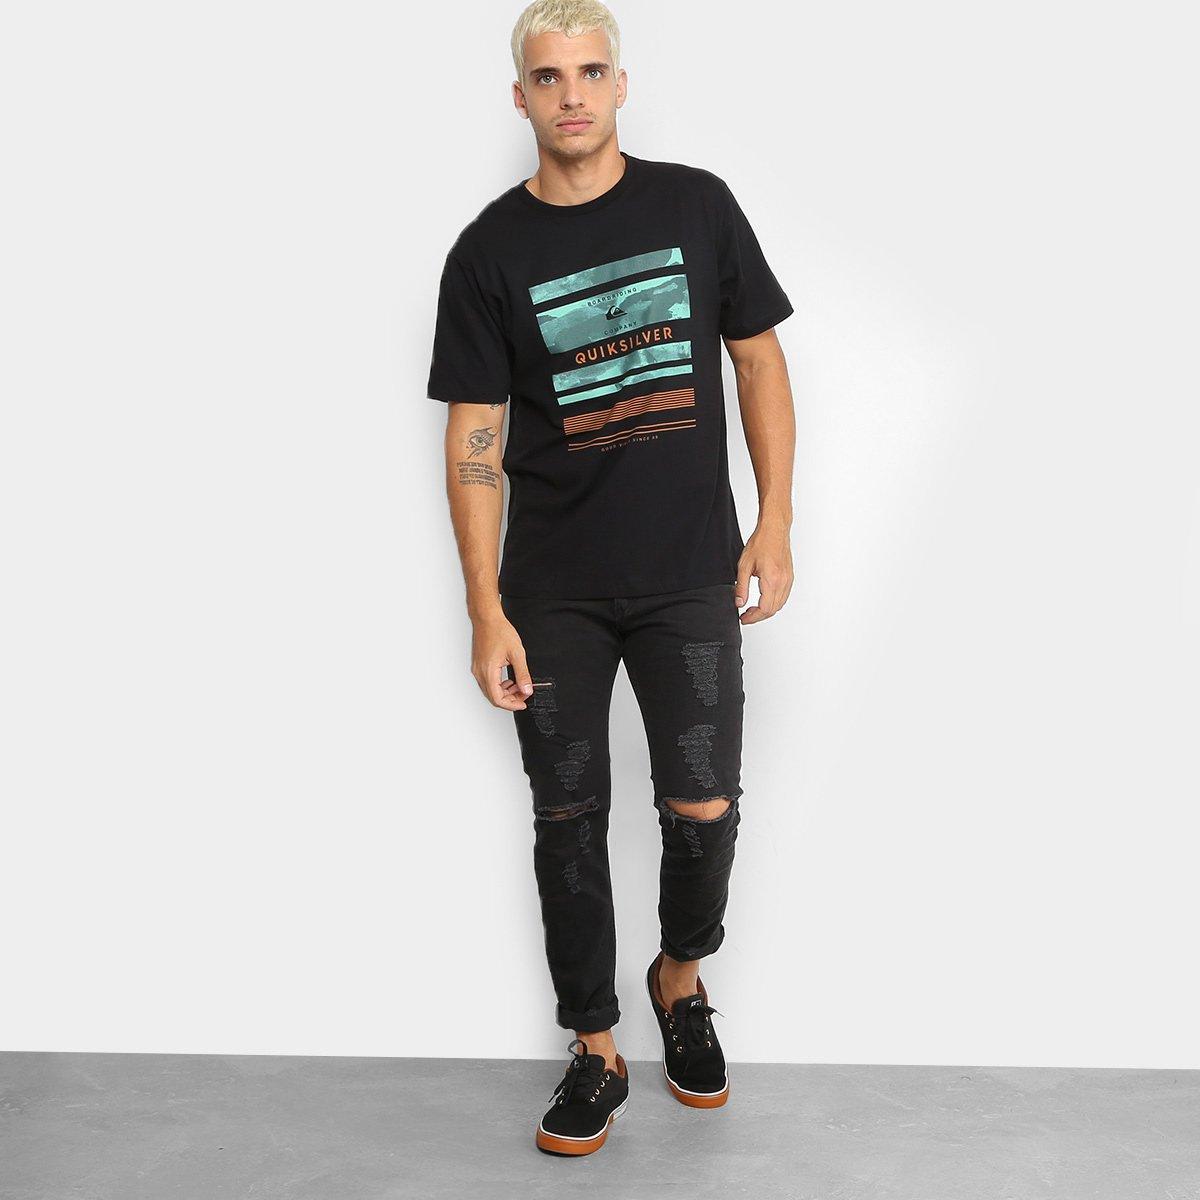 8af40fade9 Camiseta Quiksilver Stinger Masculina - Compre Agora